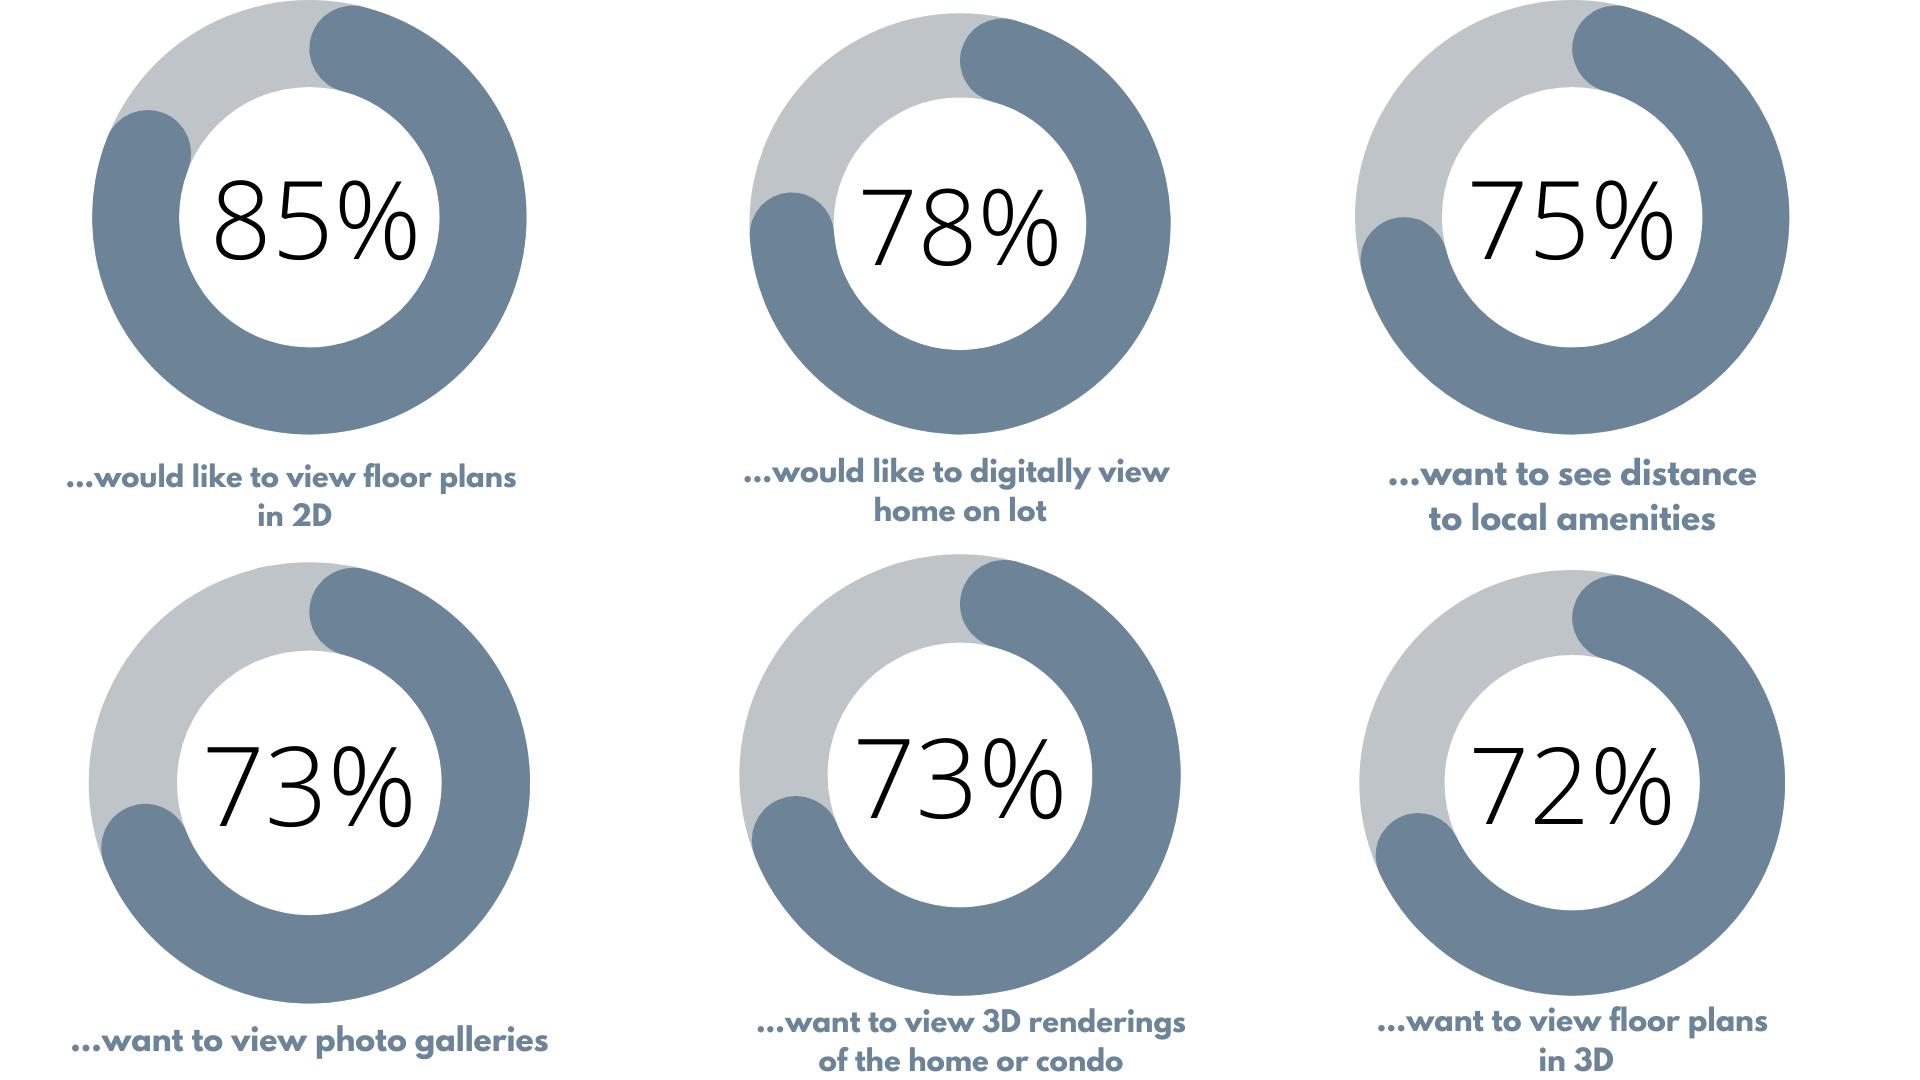 Neezo_Leger_Survey